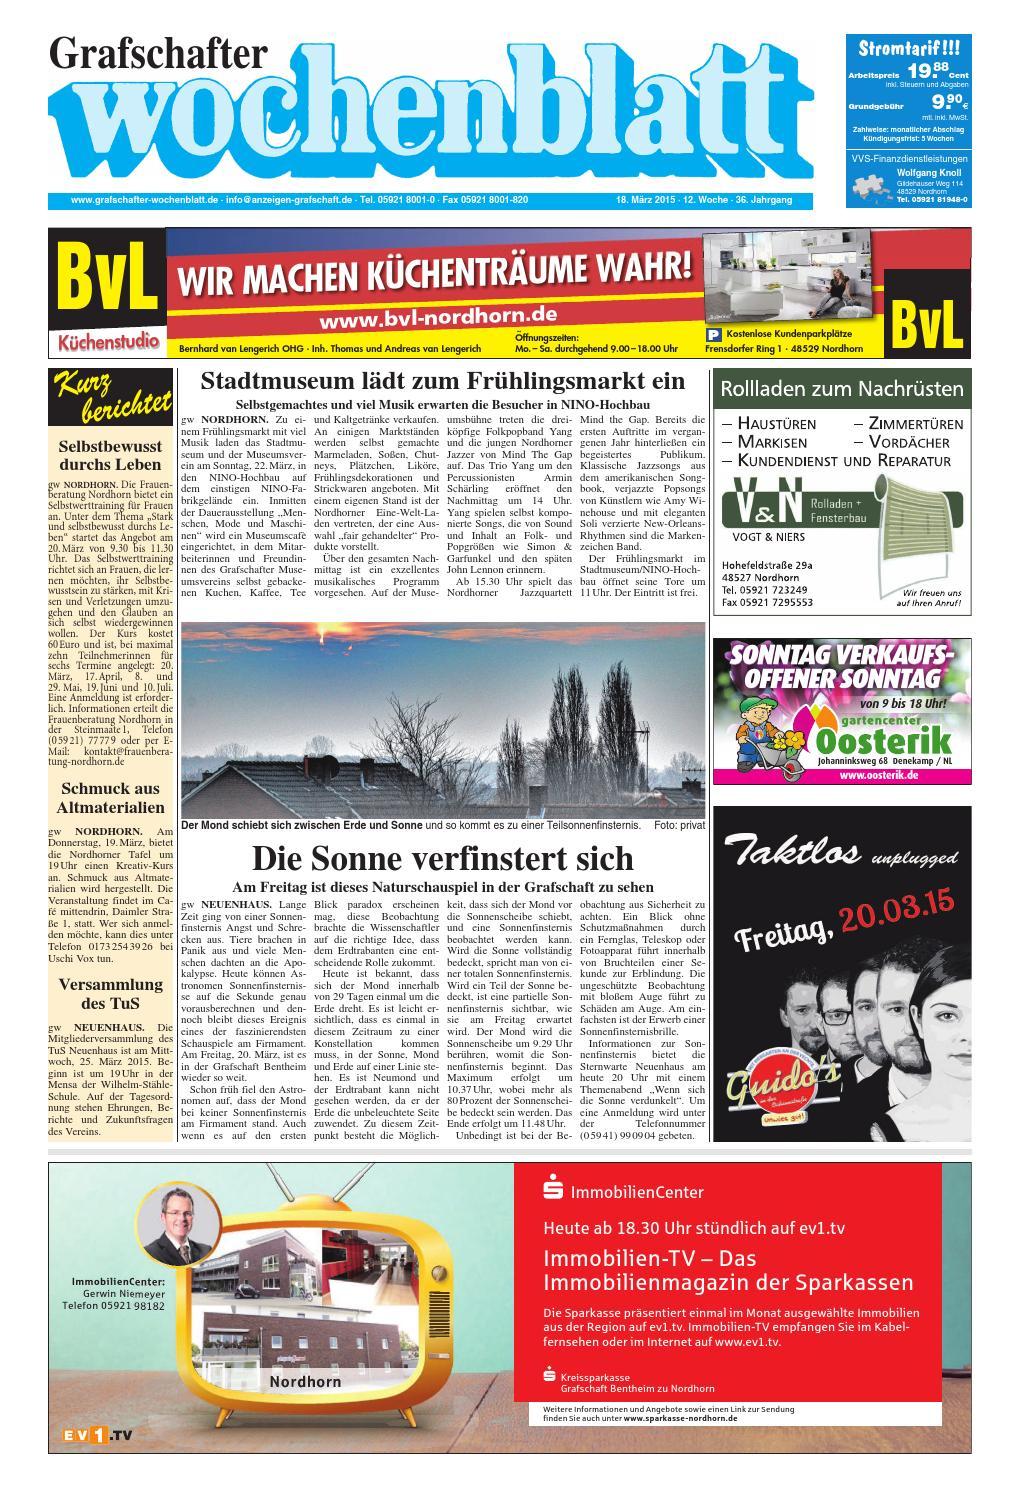 Grafschafter Wochenblatt_18.3.2015 by SonntagsZeitung - issuu